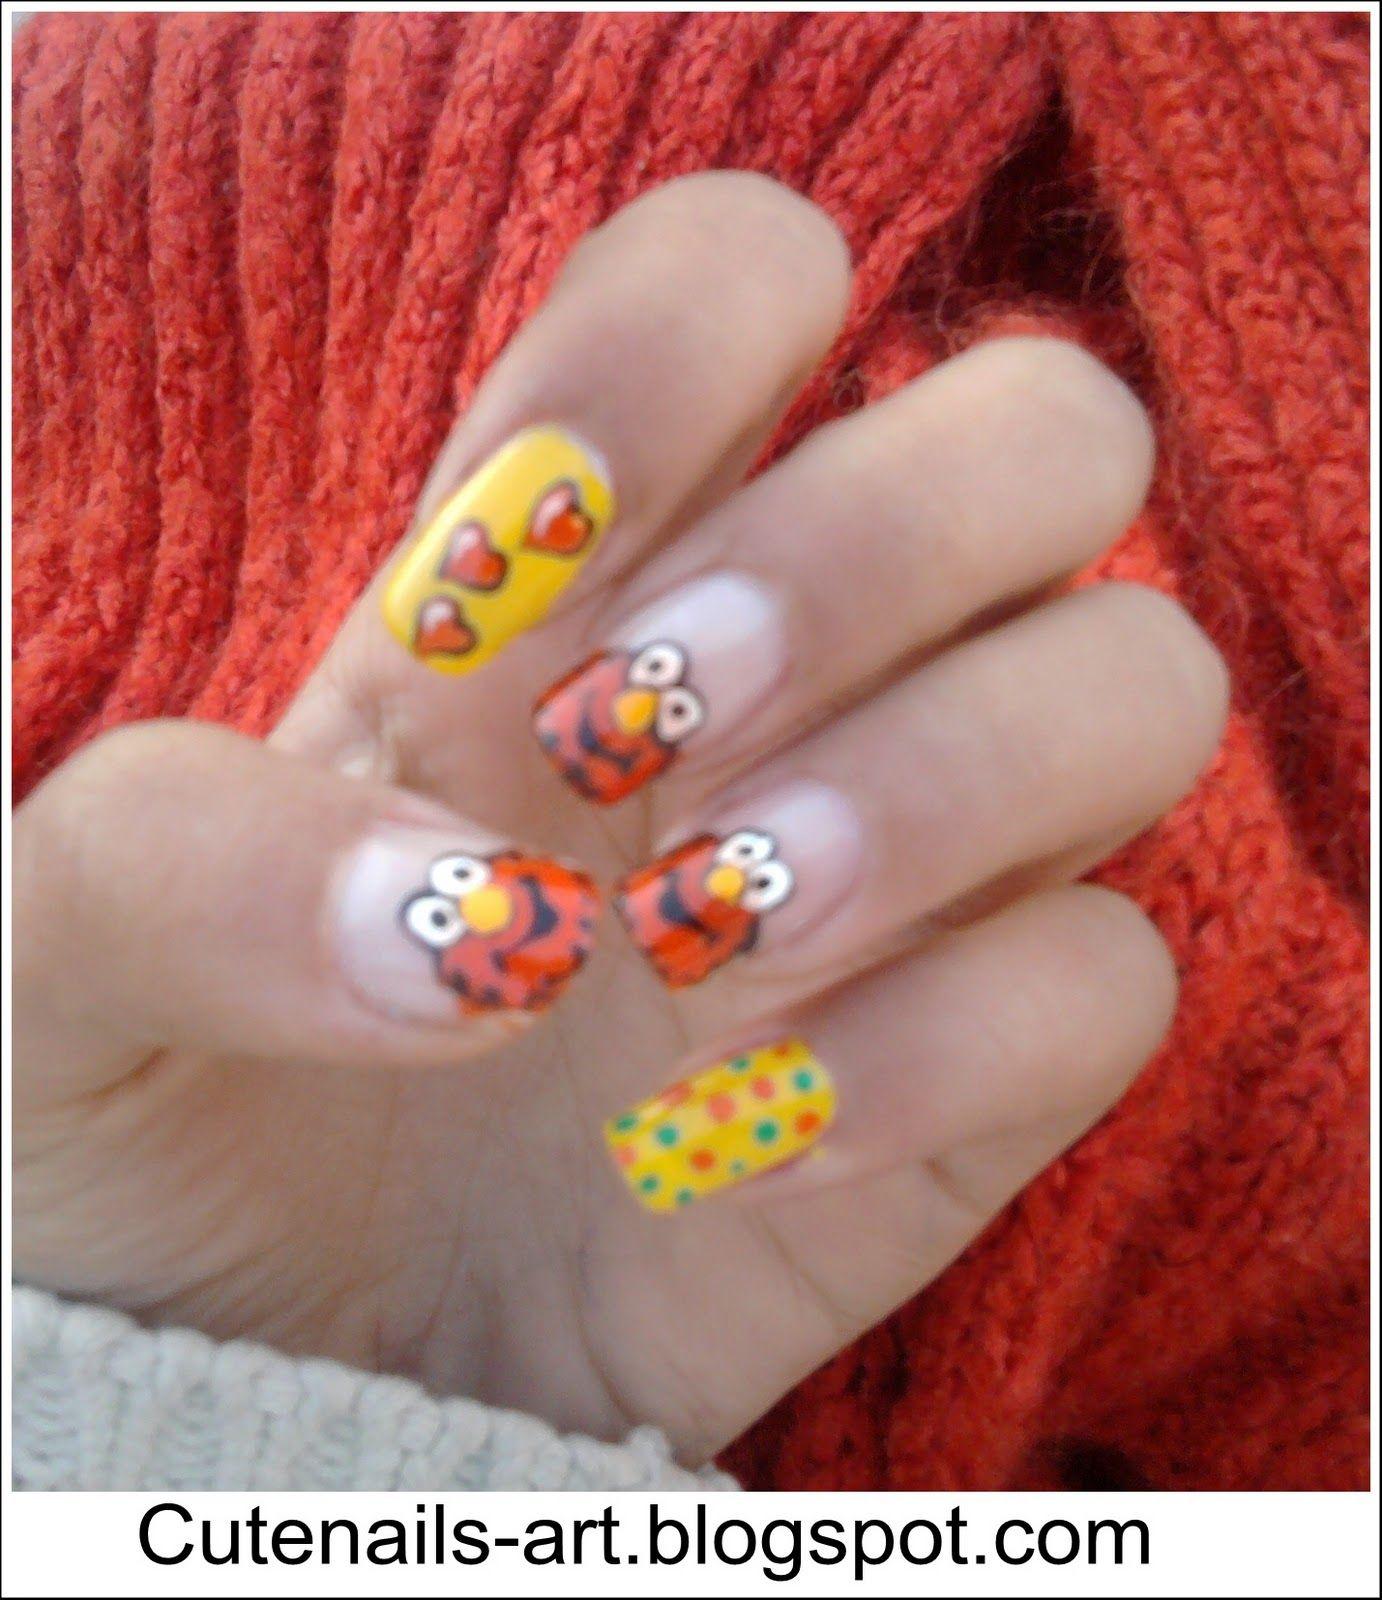 elmo nail designs | cutenails-art | Fingernail Art (Summer) | Pinterest